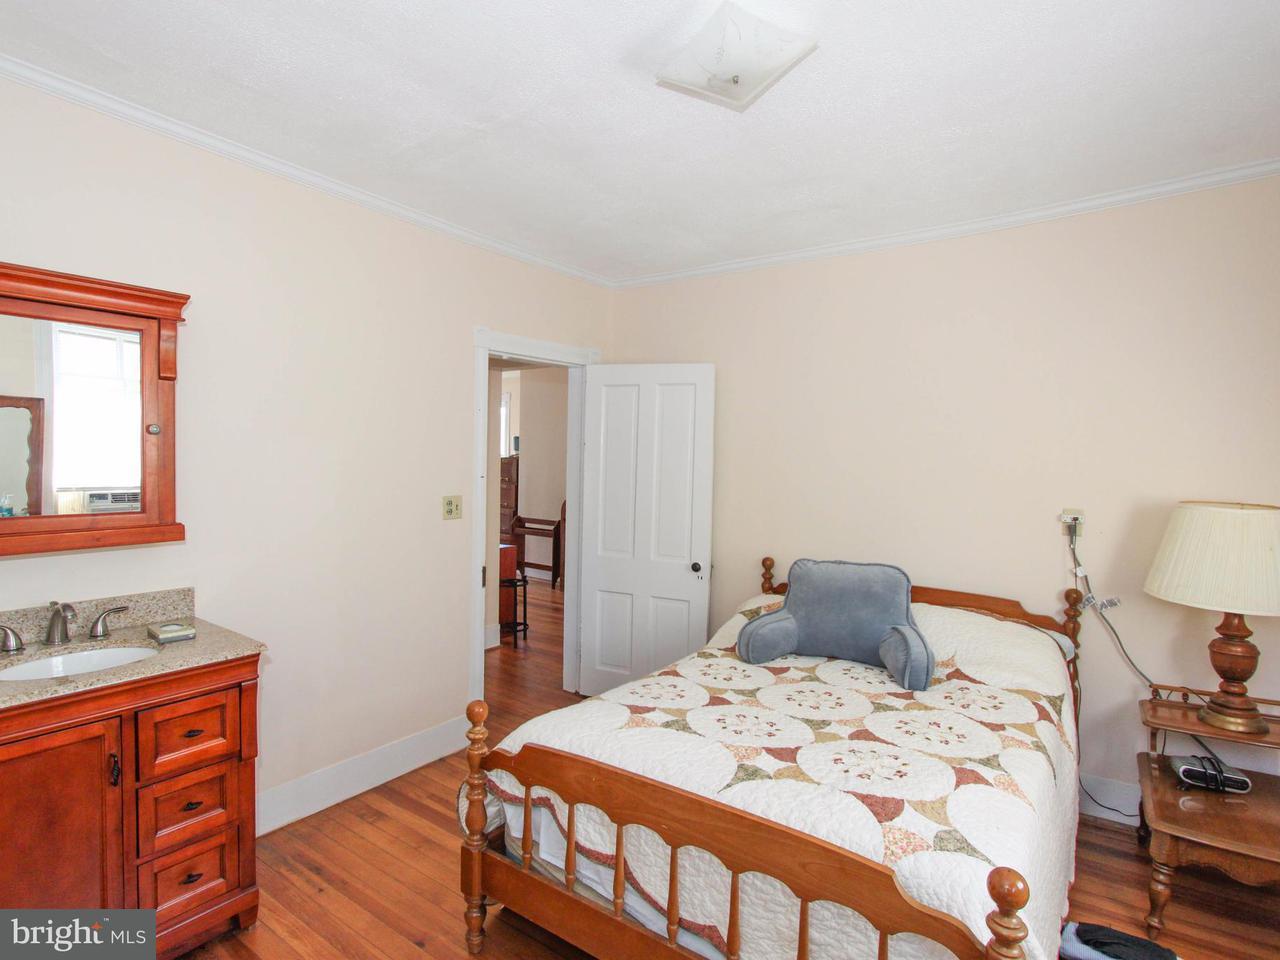 Additional photo for property listing at 429 Prospect Avenue 429 Prospect Avenue Harpers Ferry, Западная Виргиния 25425 Соединенные Штаты